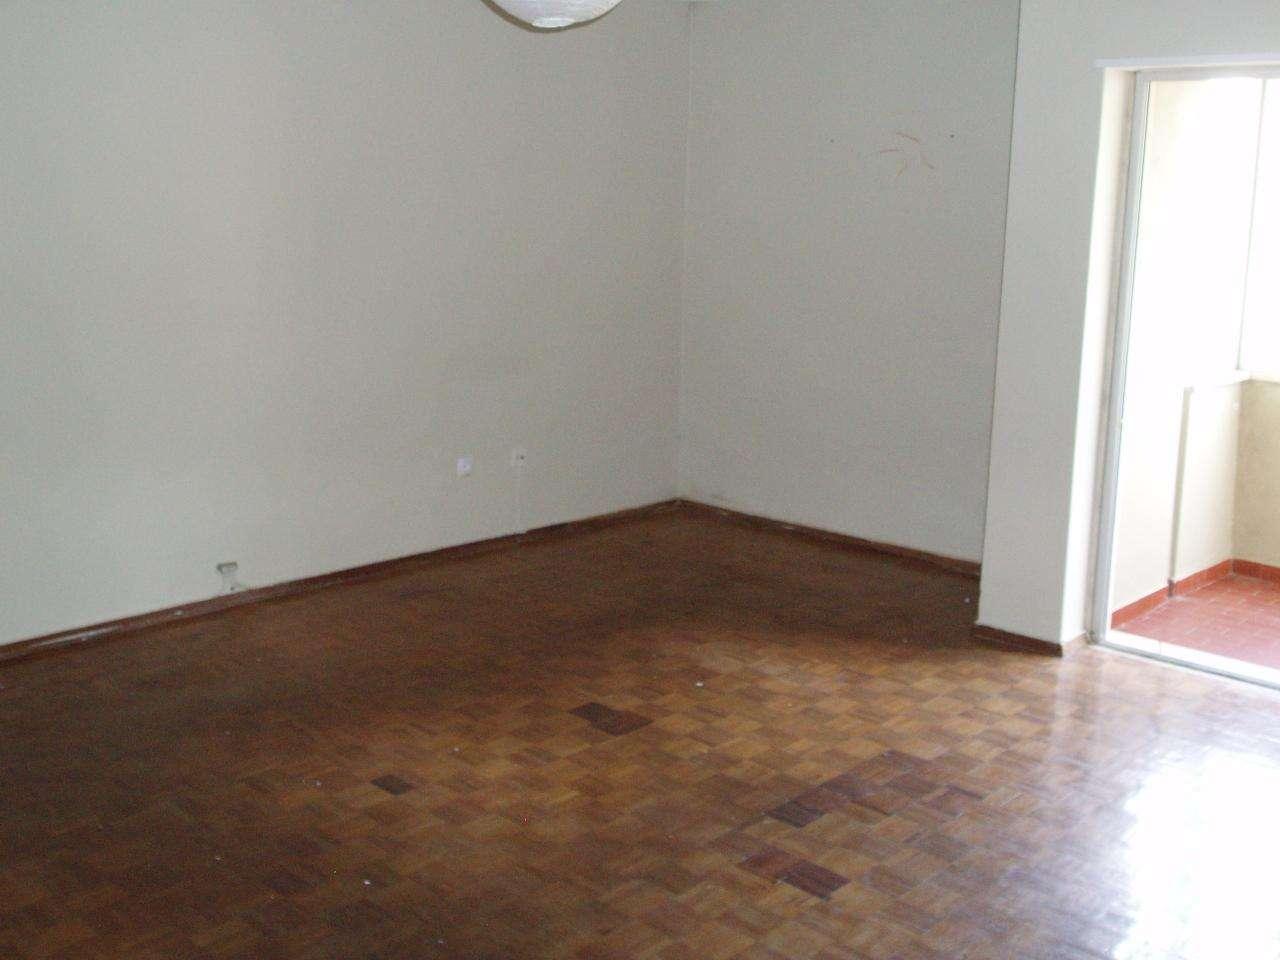 Apartamento para comprar, Alcabideche, Cascais, Lisboa - Foto 6